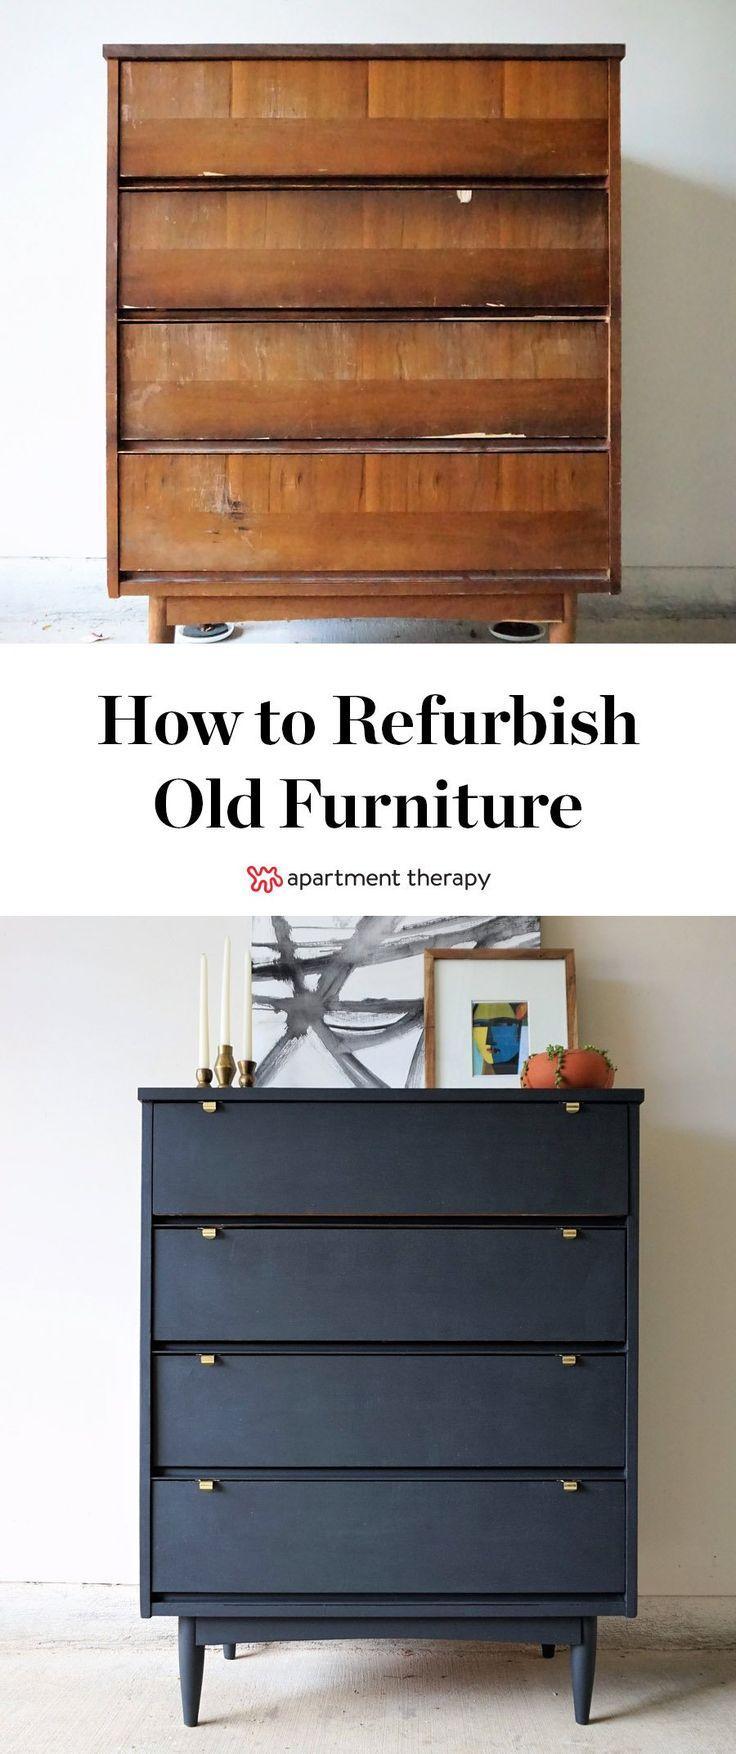 best 25 mid century modern ideas on pinterest mid century mid century living room and mid. Black Bedroom Furniture Sets. Home Design Ideas